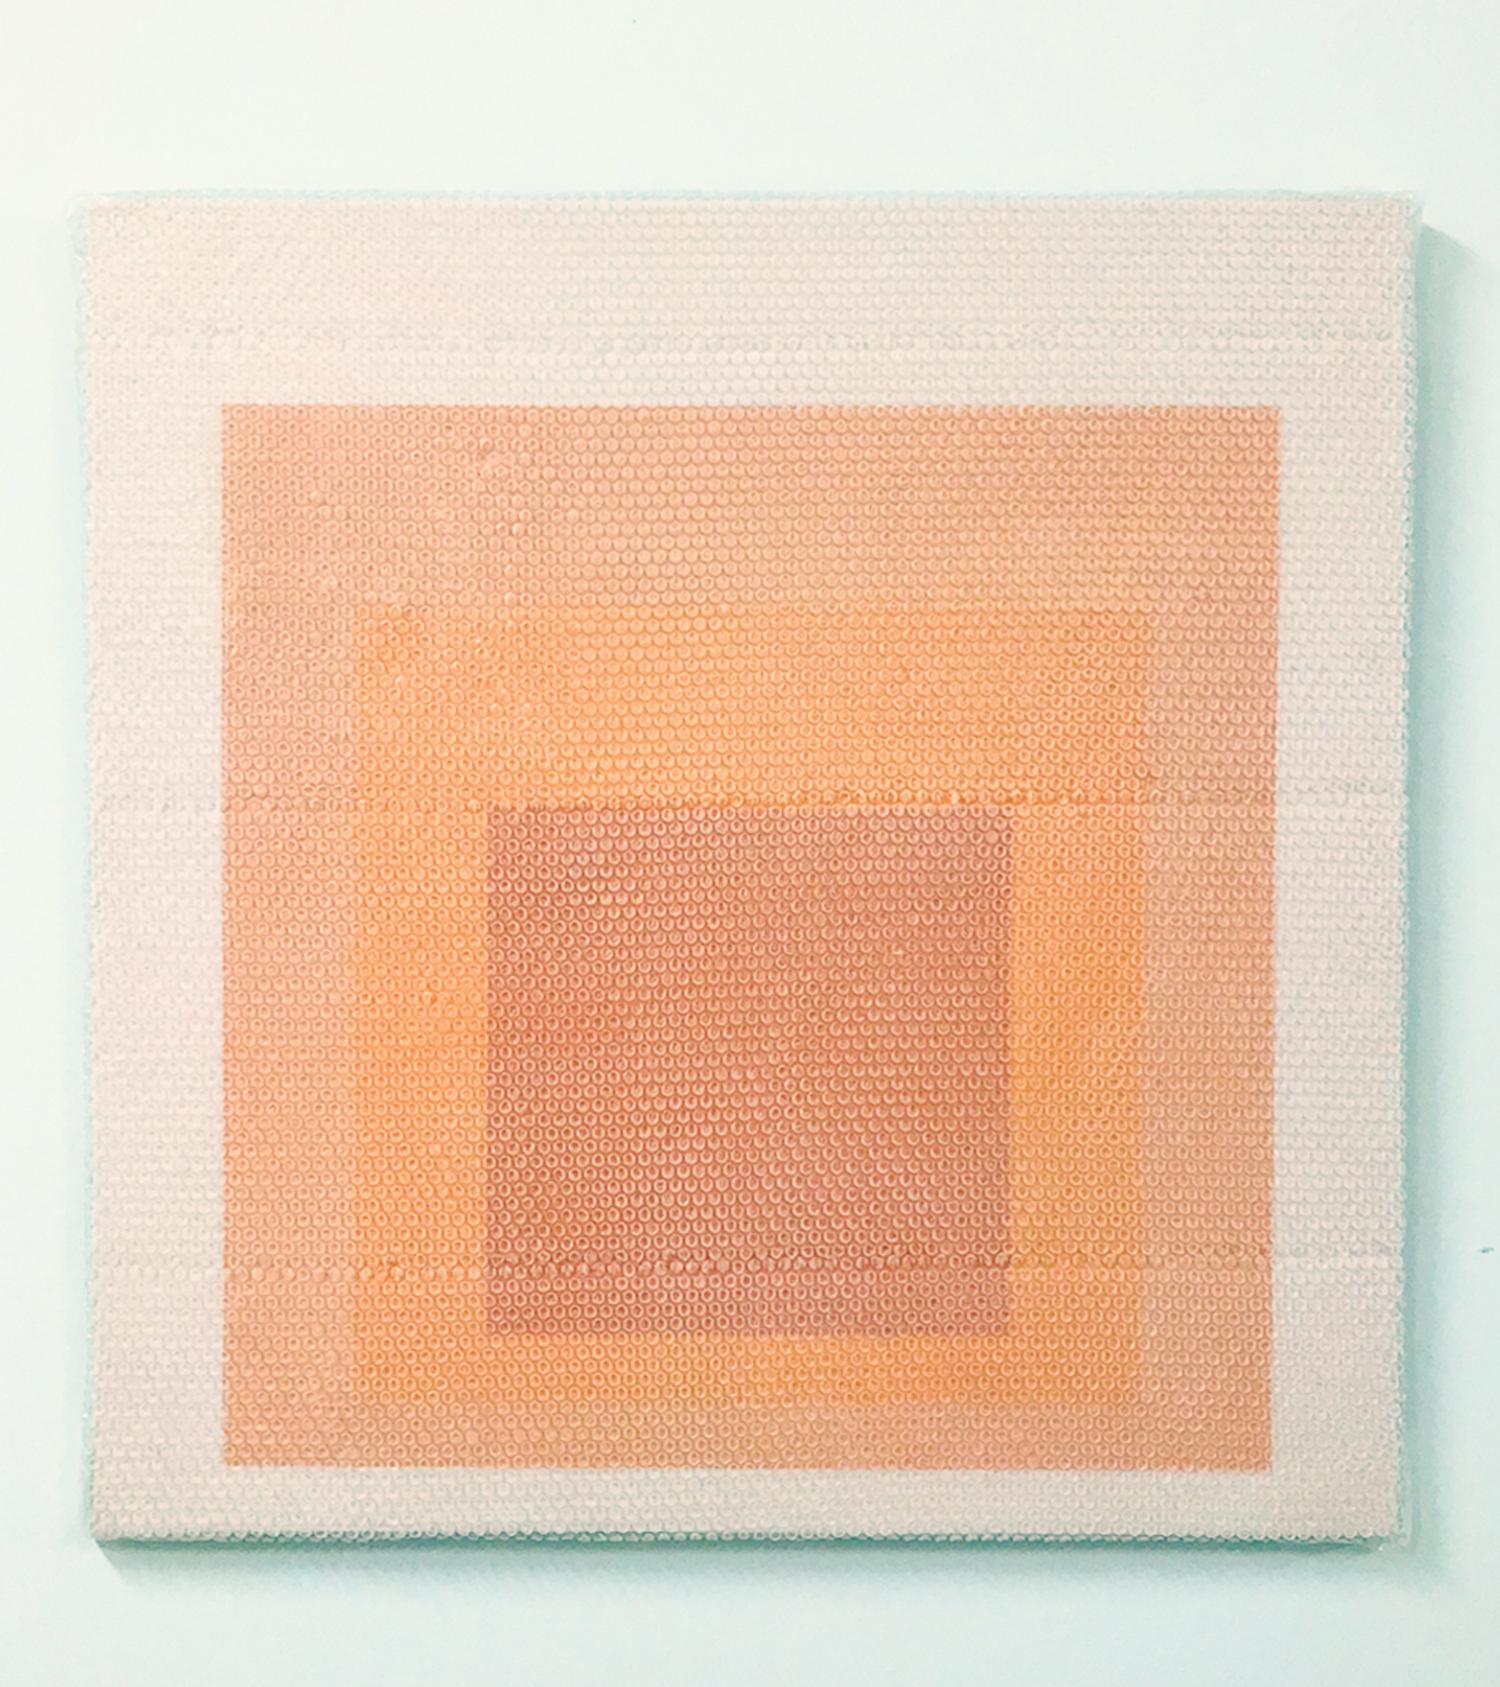 "Homage to the square #2,  2018,  Acrylique sur toile 36"" X 36""."